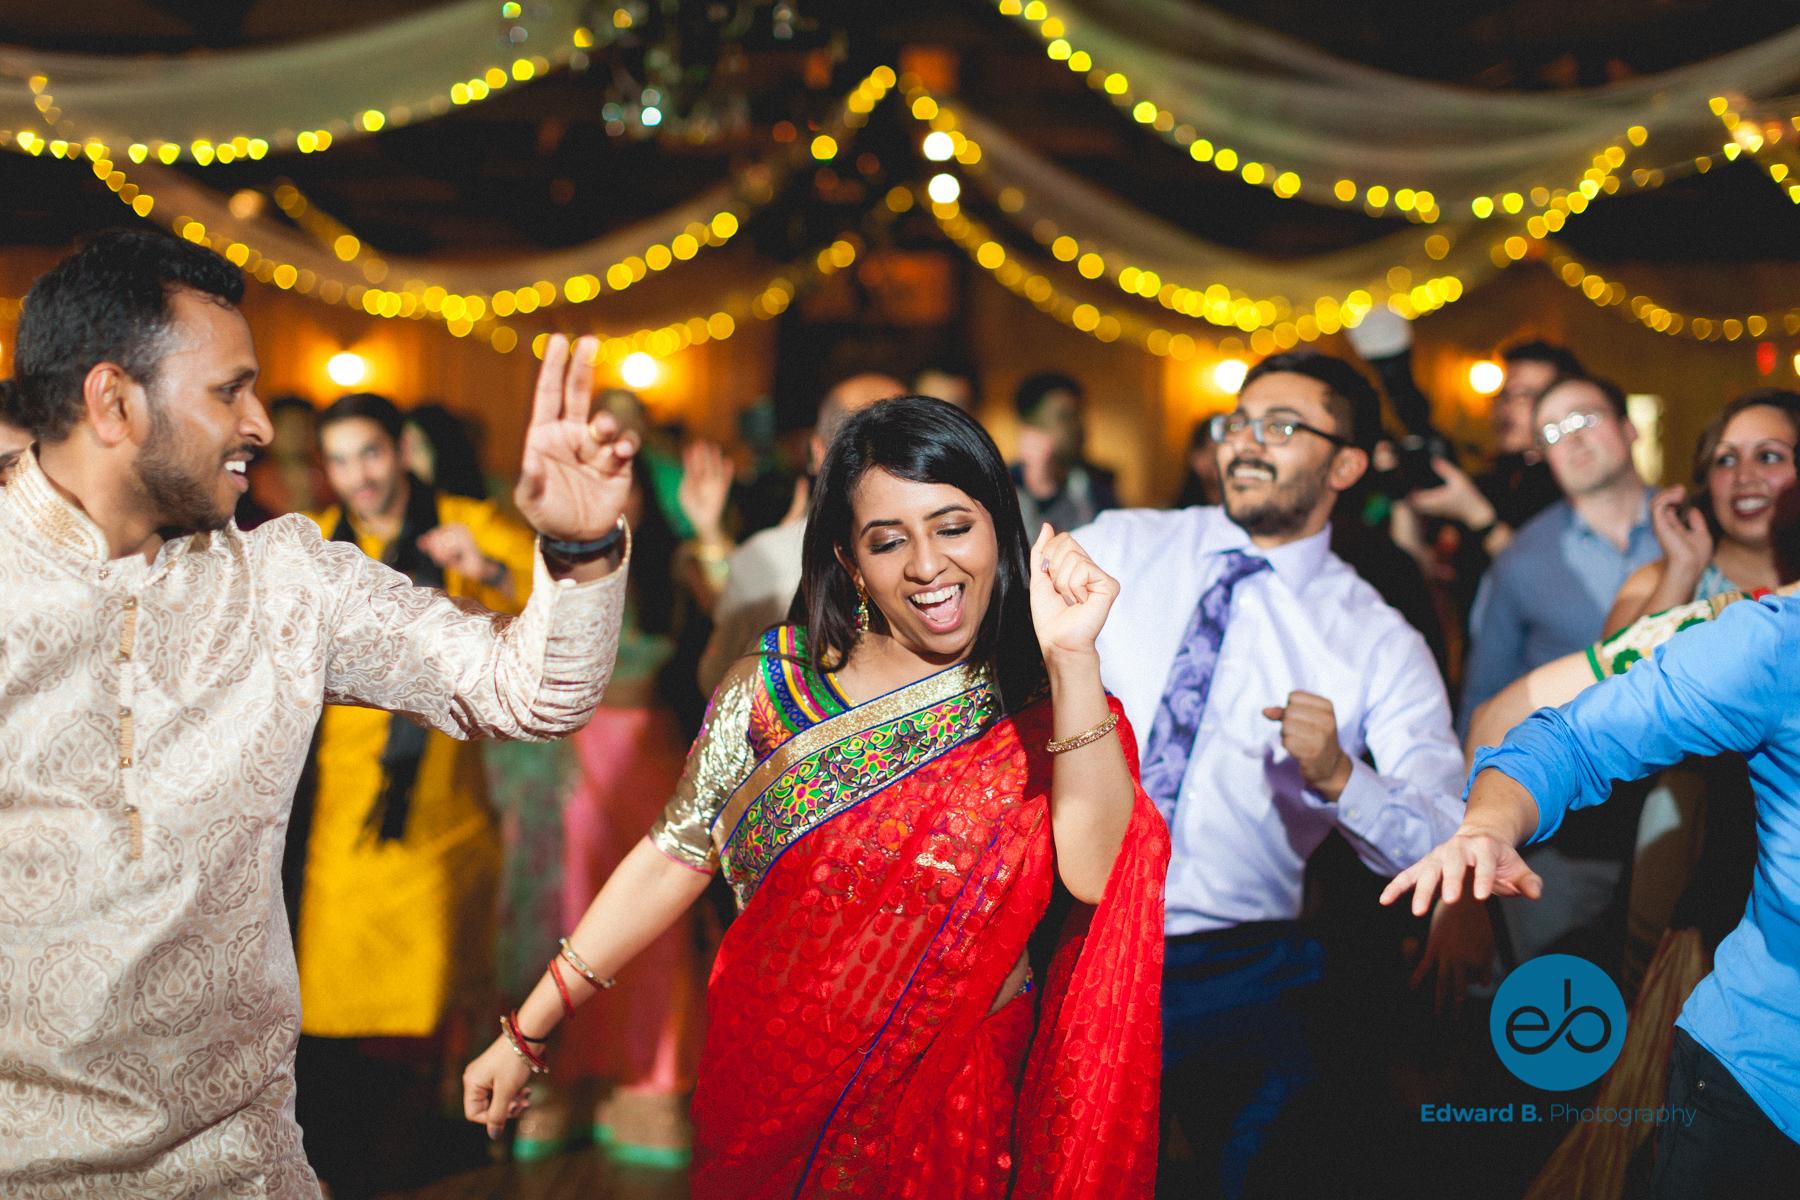 indian-wedding-engagement-reception-san-antonio-austin-texas-28.jpg